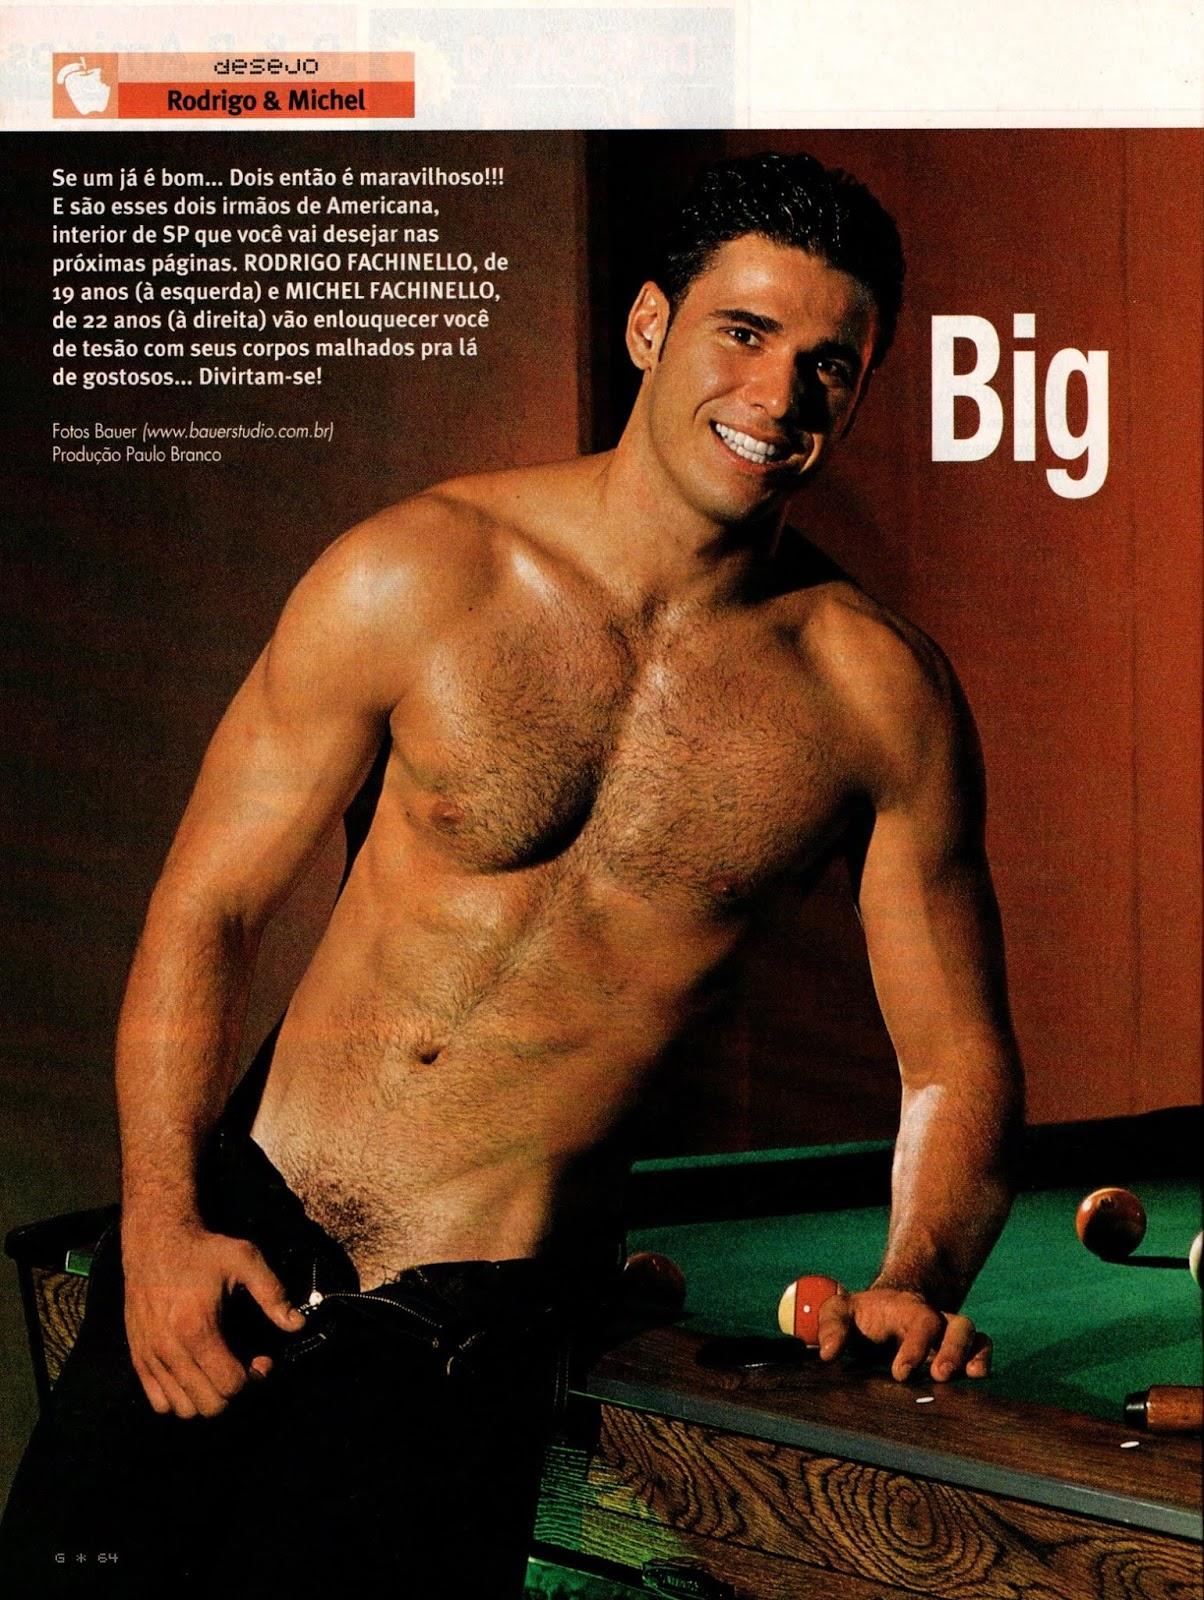 Rodrigo Michel Fachinello gay hot daddy dude men porn twins